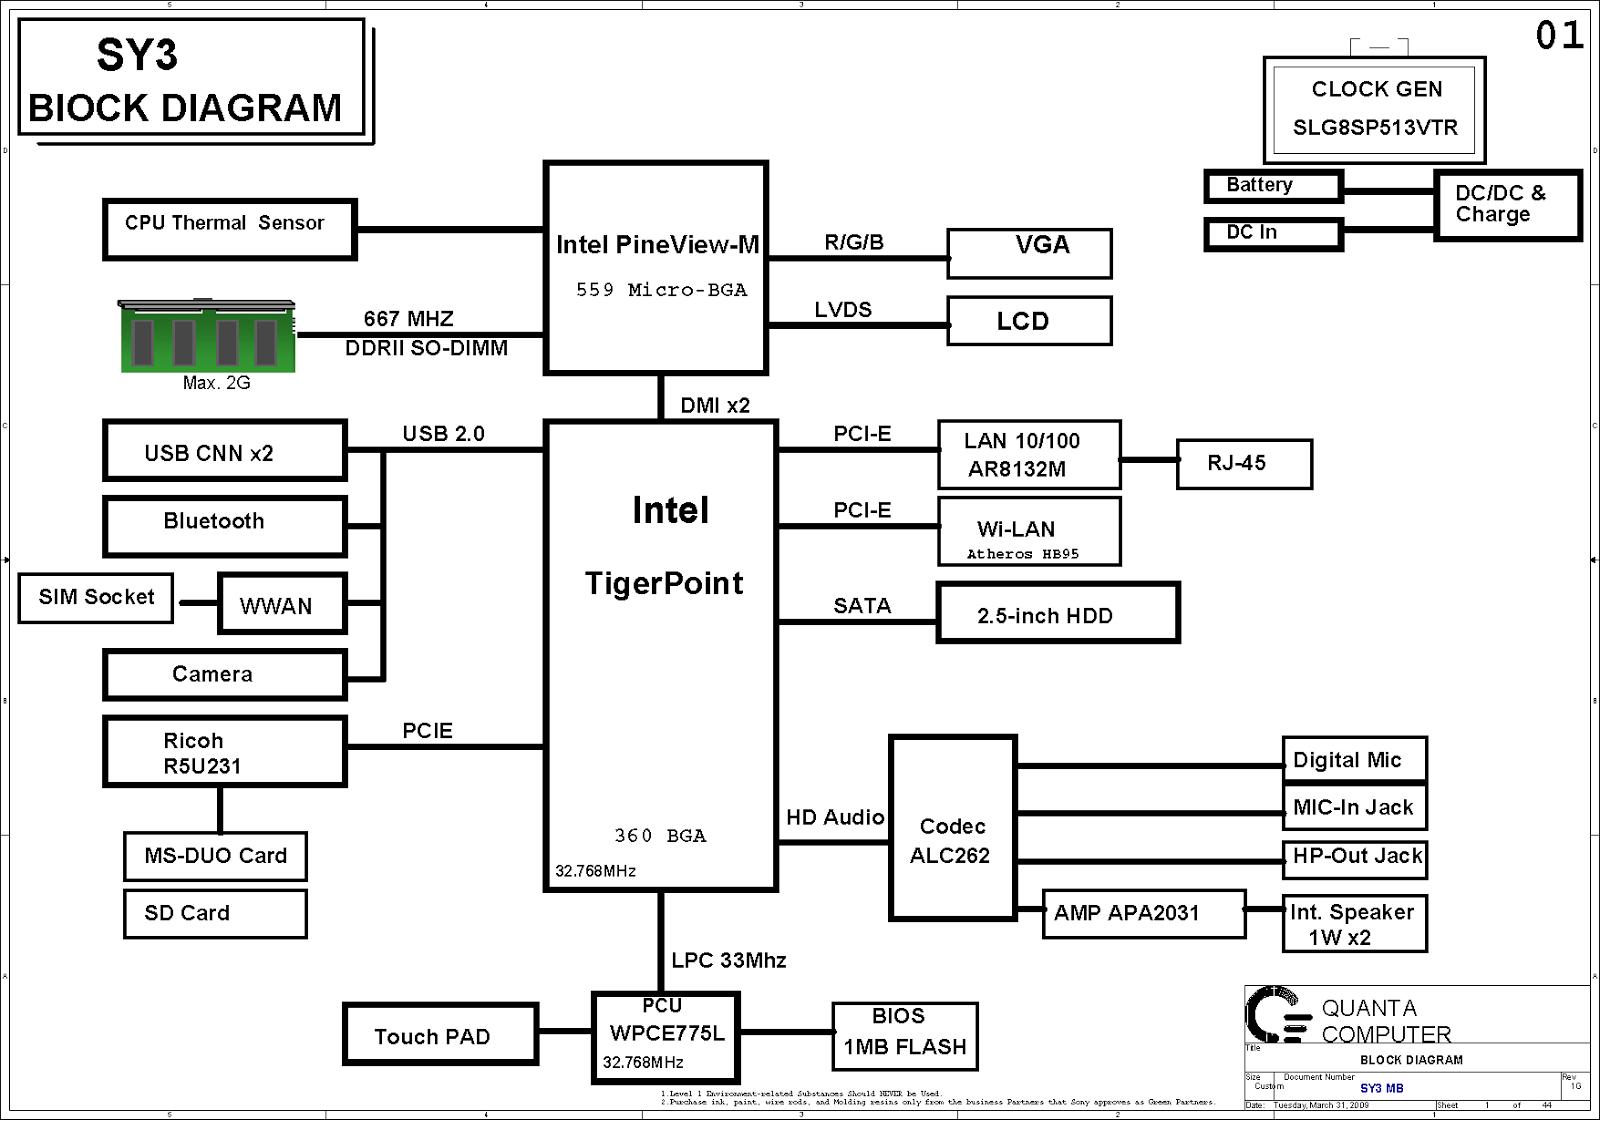 Schematic Diagram Gigabyte Motherboard: Laptop maintenance